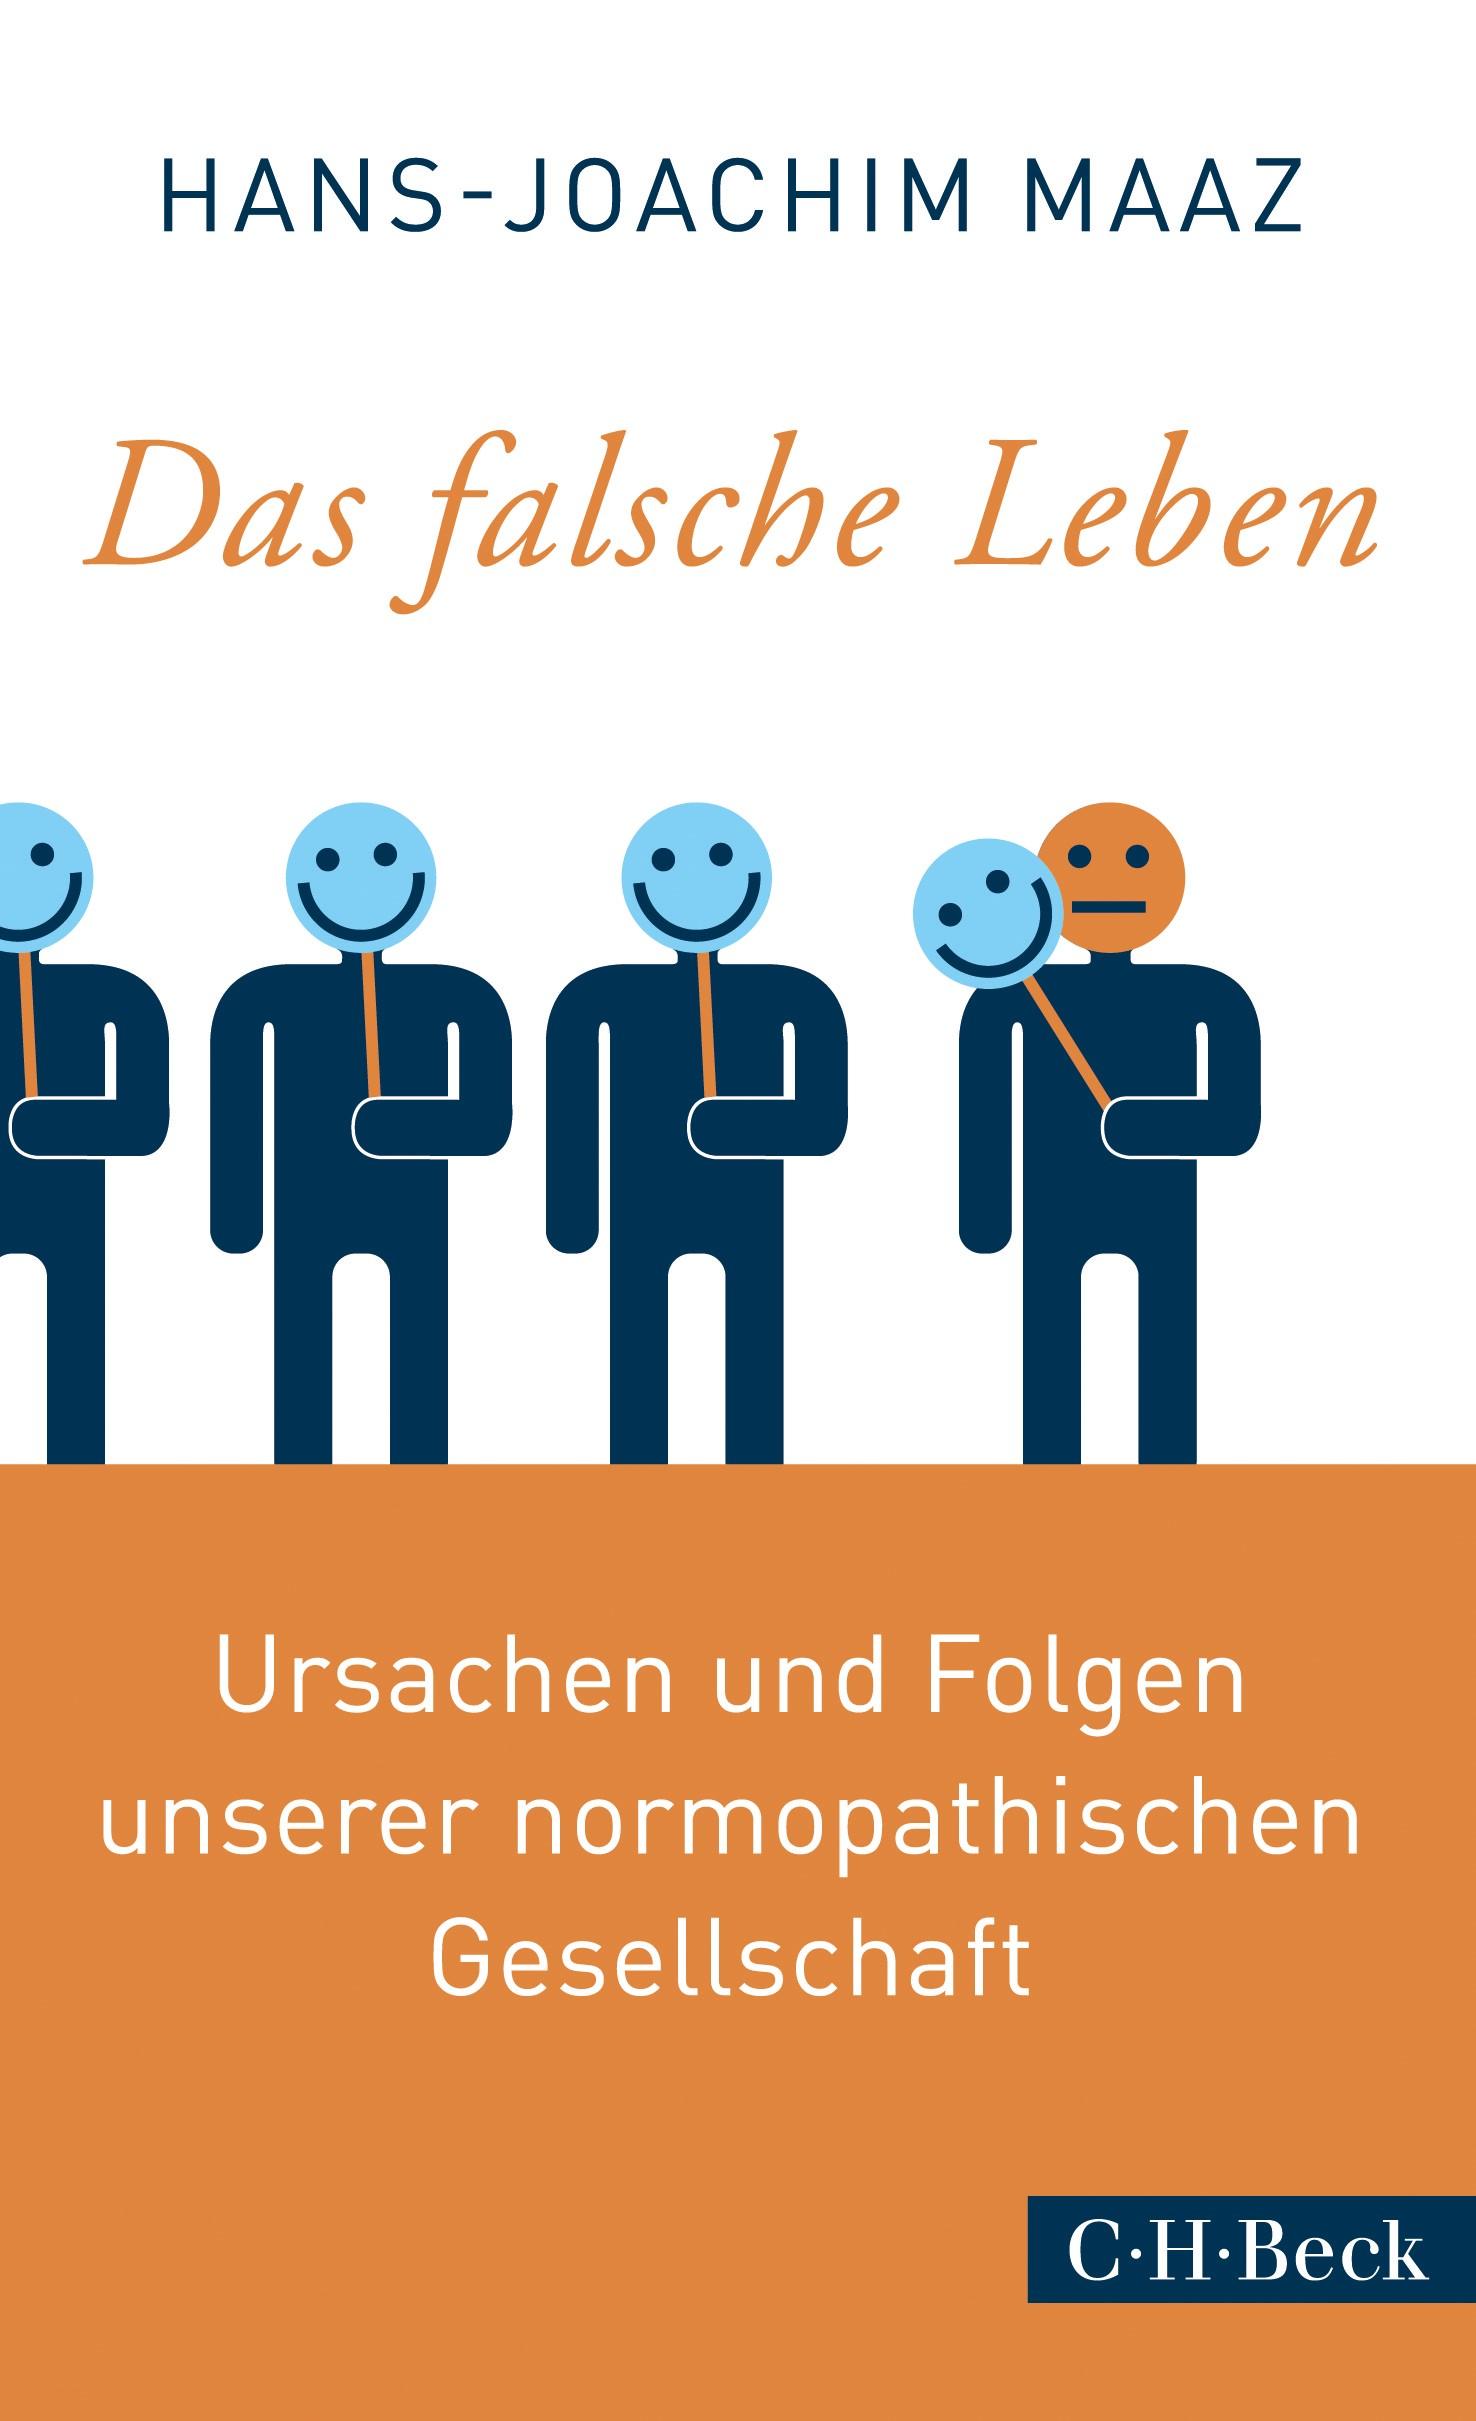 Das falsche Leben | Maaz, Hans-Joachim | 4. Auflage | Buch (Cover)